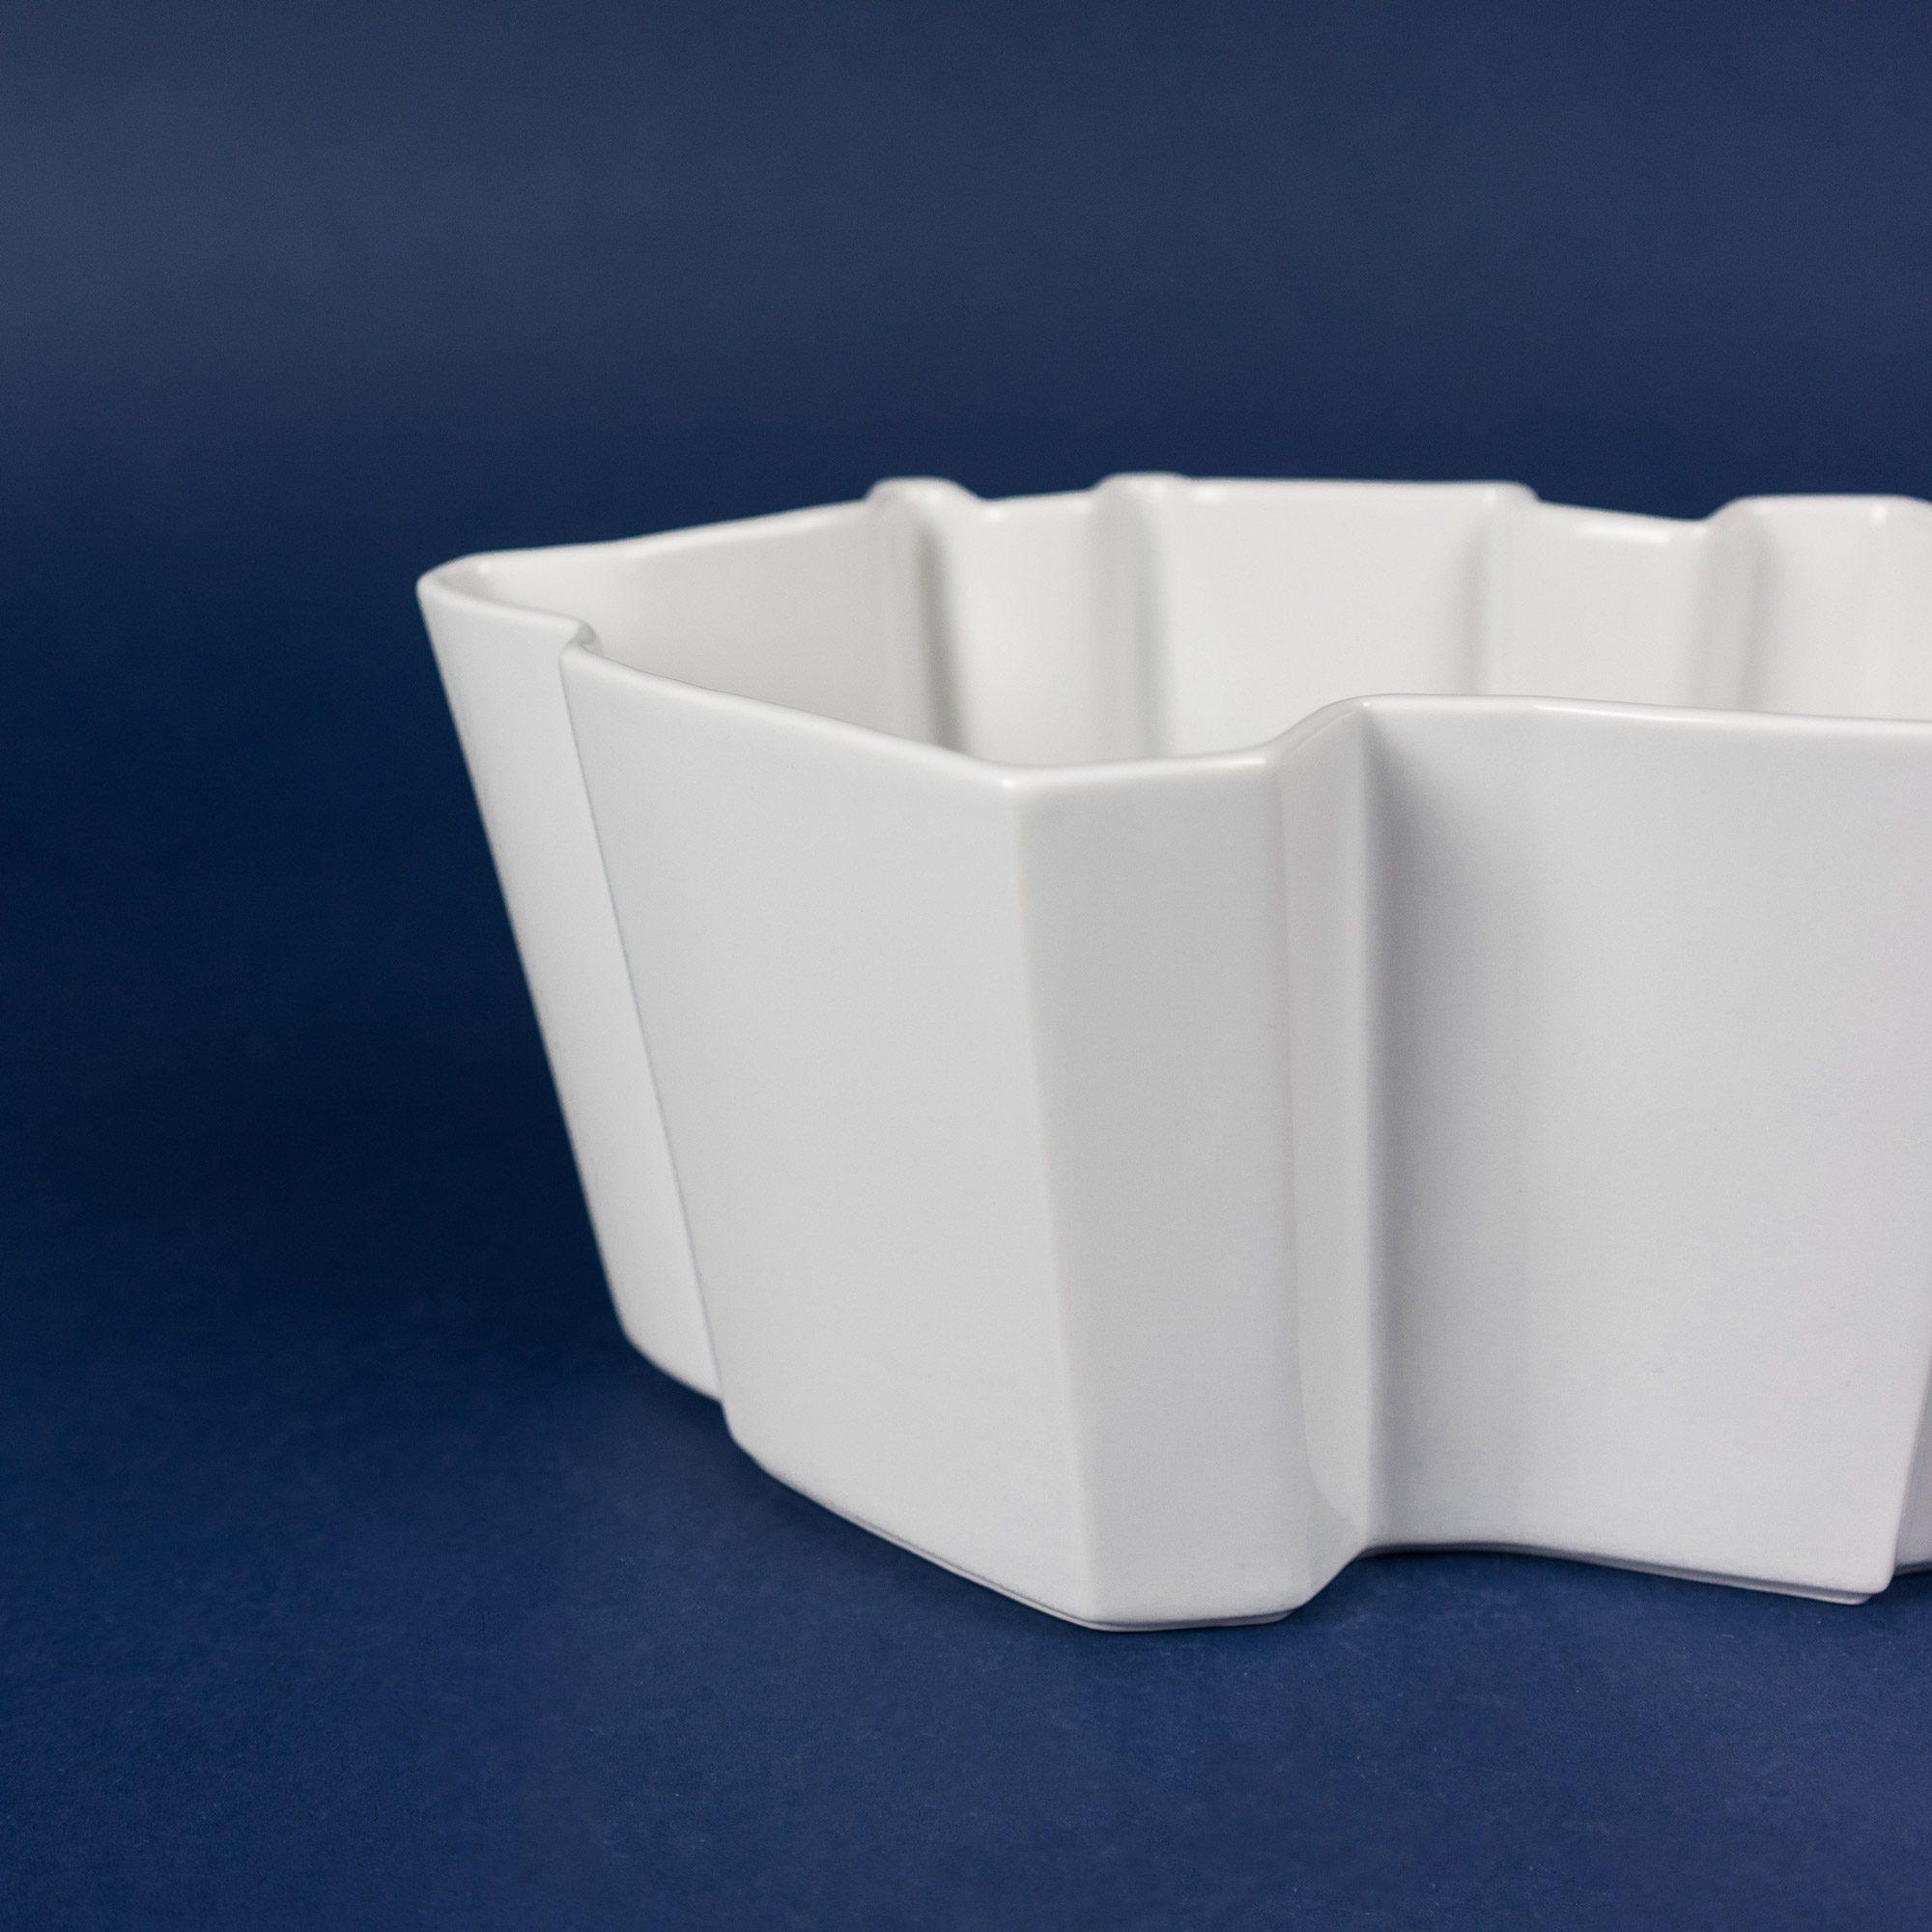 White porcelain bowl by Qubus design studio